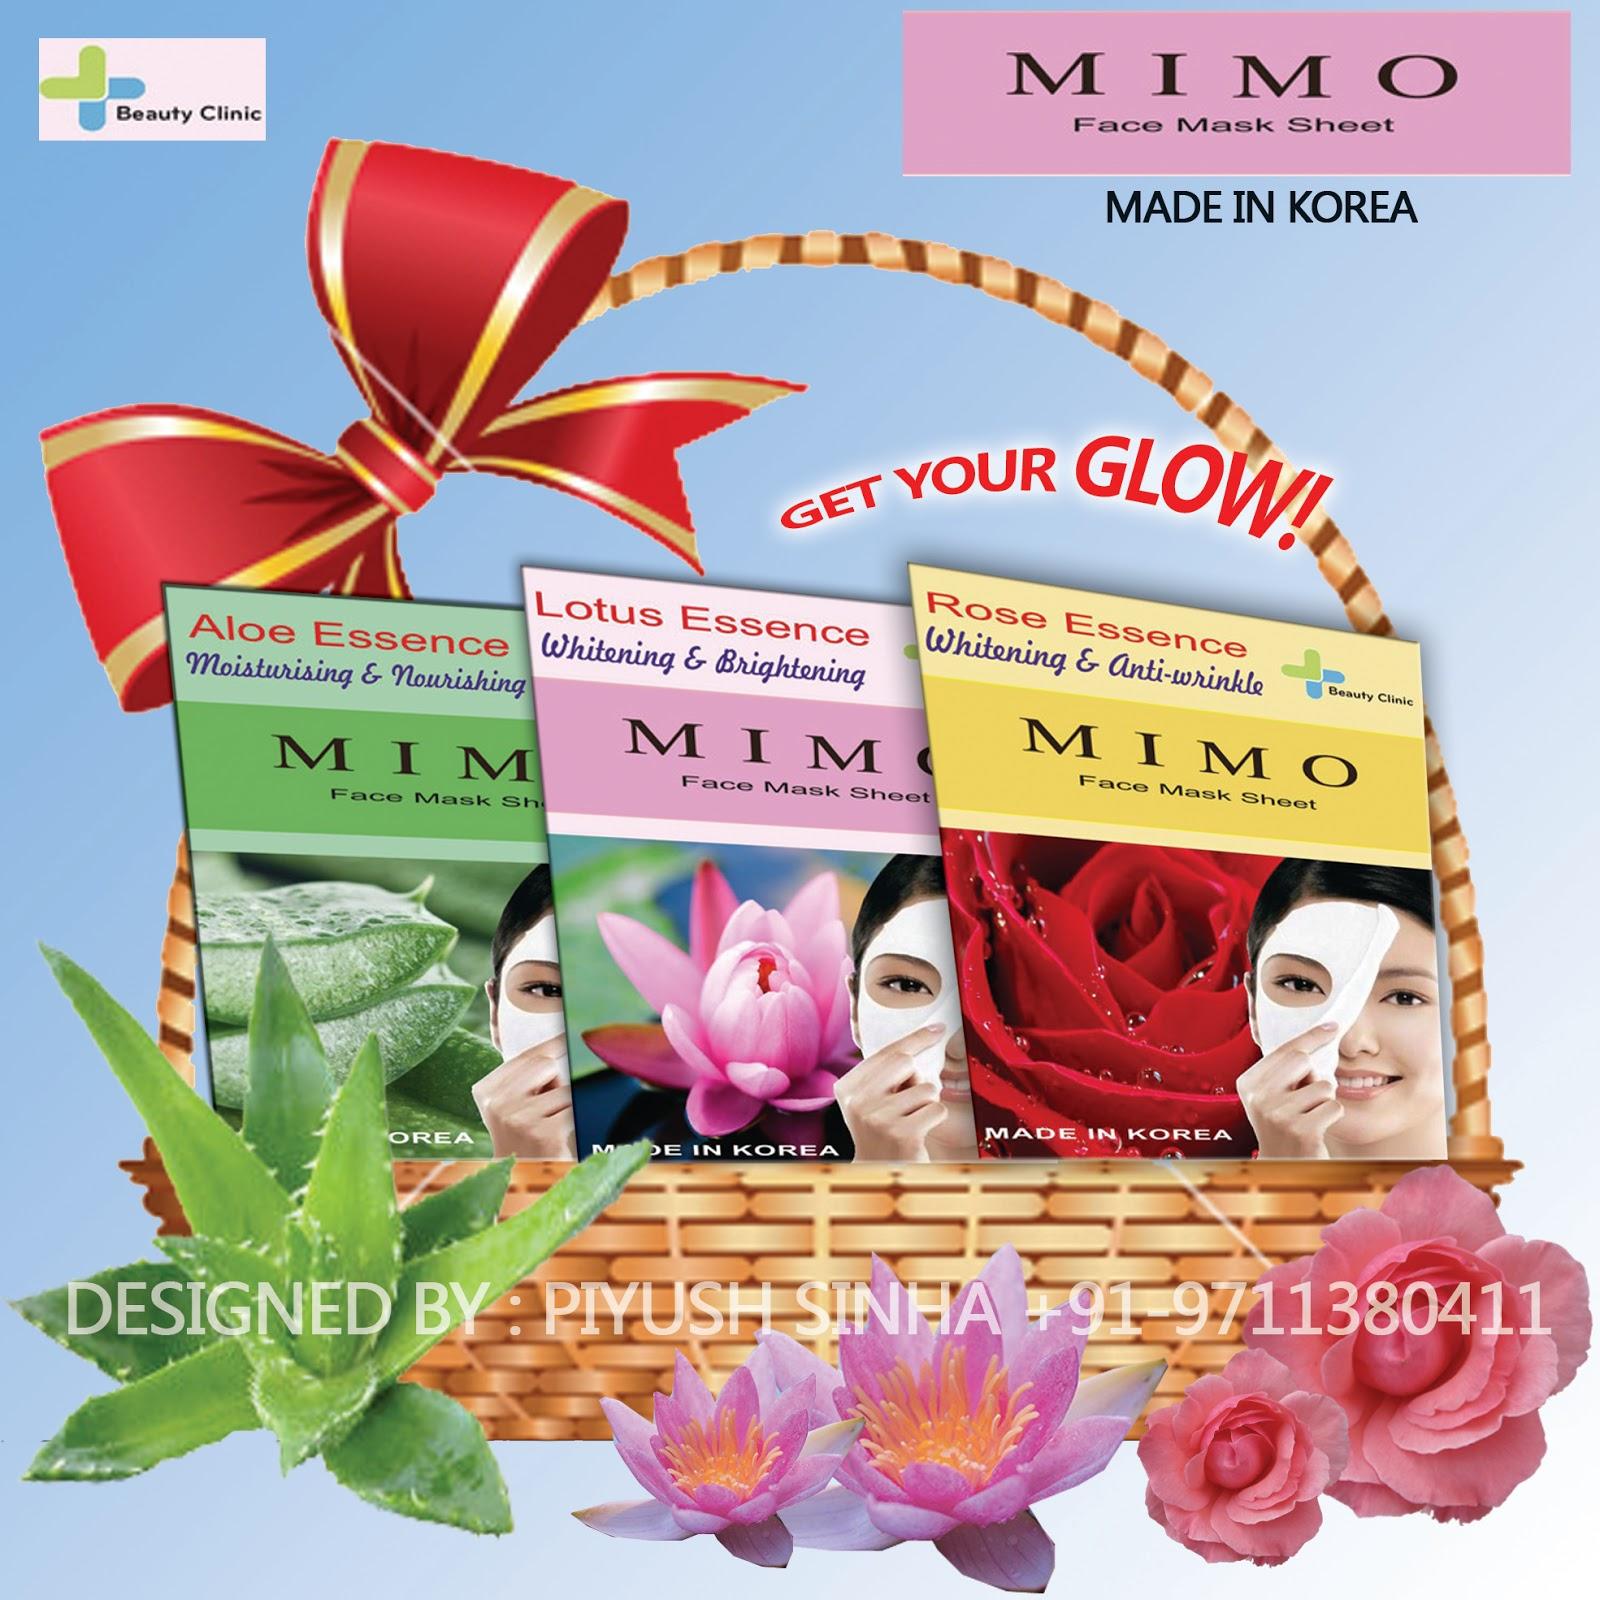 Mimo Sheet Face Mask Lotus Essence Mimo Cosmetics India